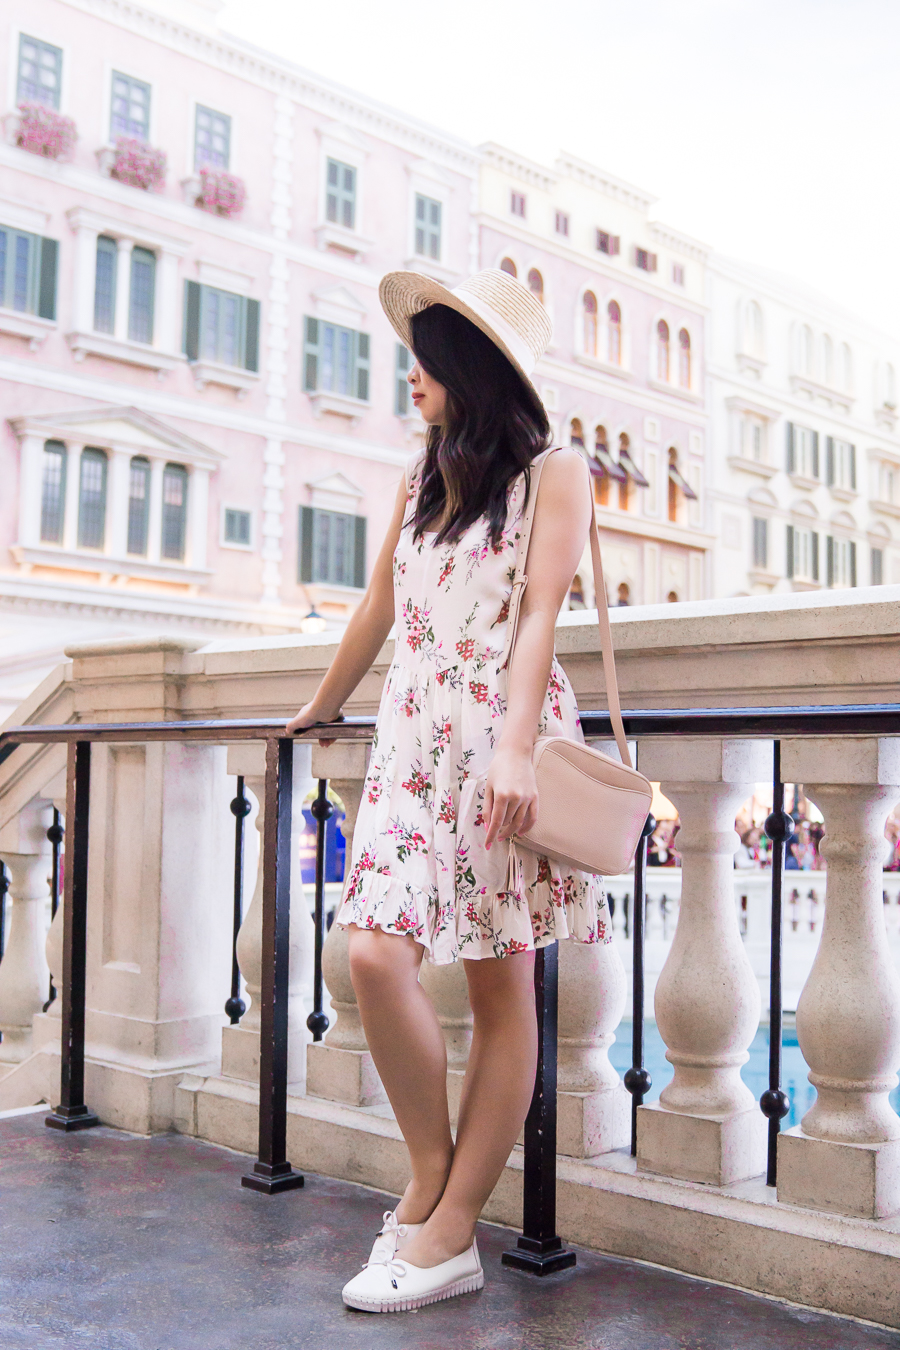 12 hours in Macau, Macau itinerary, things to do in Macau, Seattle fashion blogger, Macau Venetian Hotel